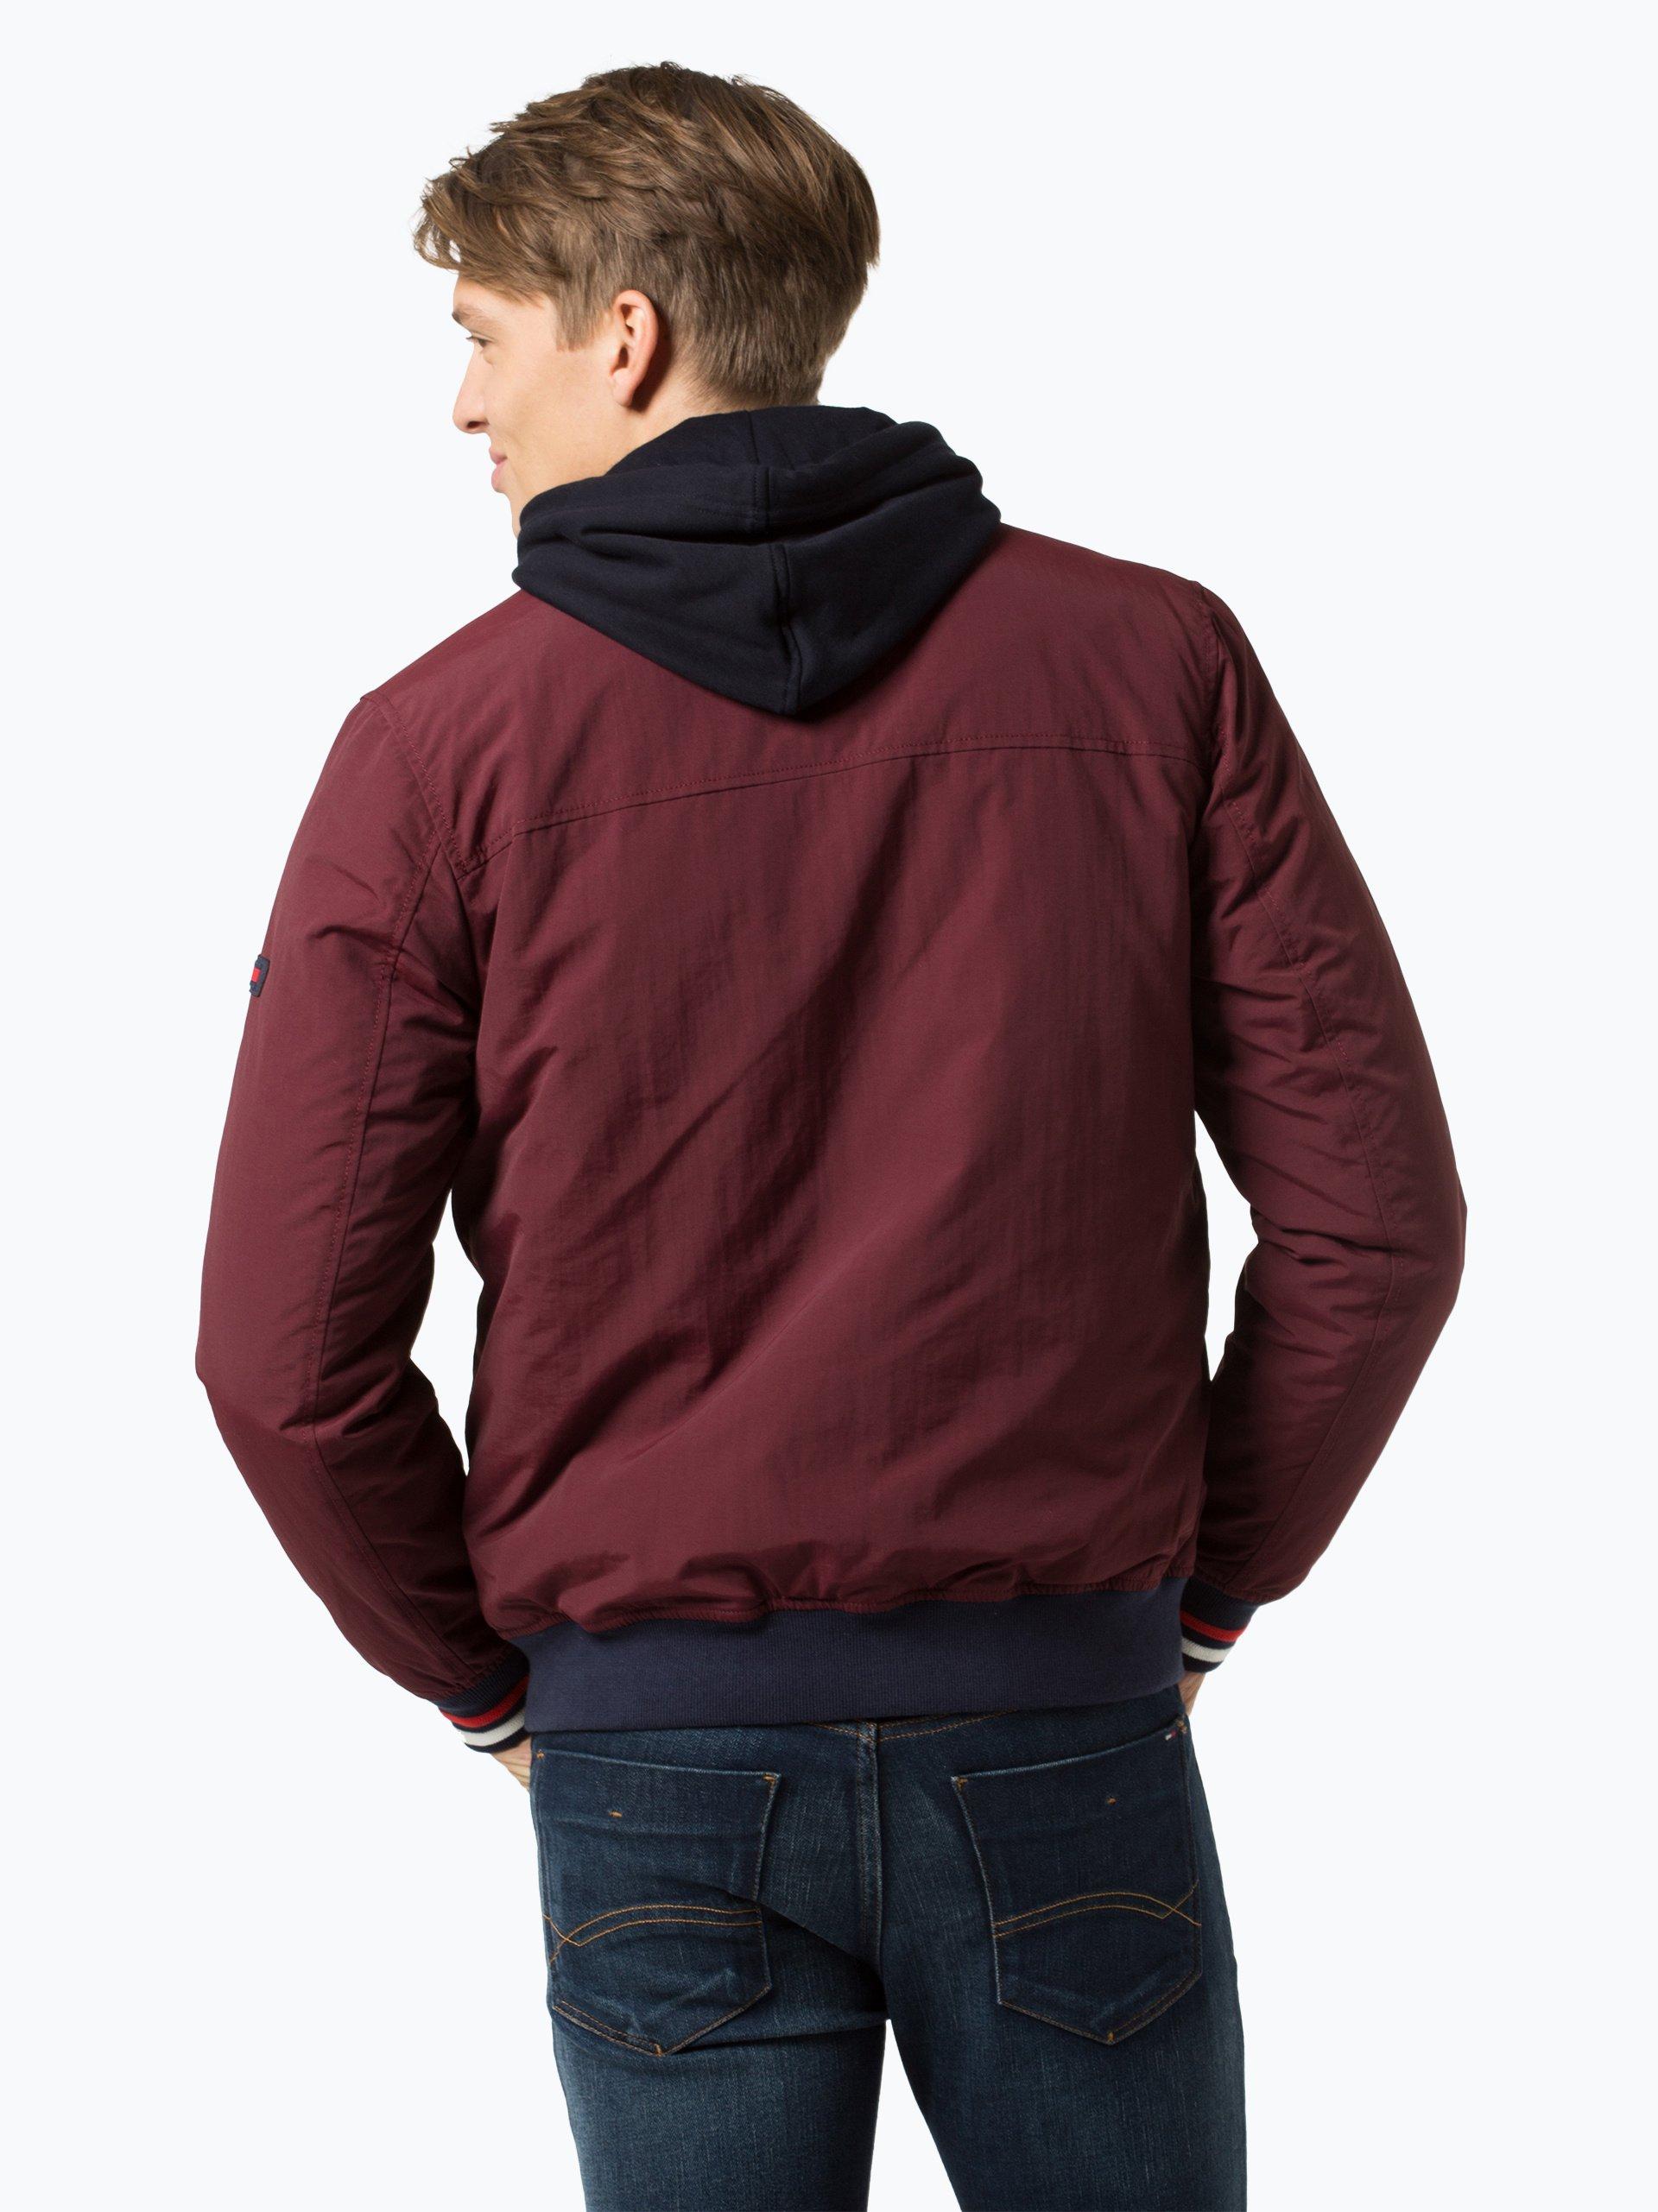 tommy jeans herren jacke bordeaux uni online kaufen peek. Black Bedroom Furniture Sets. Home Design Ideas